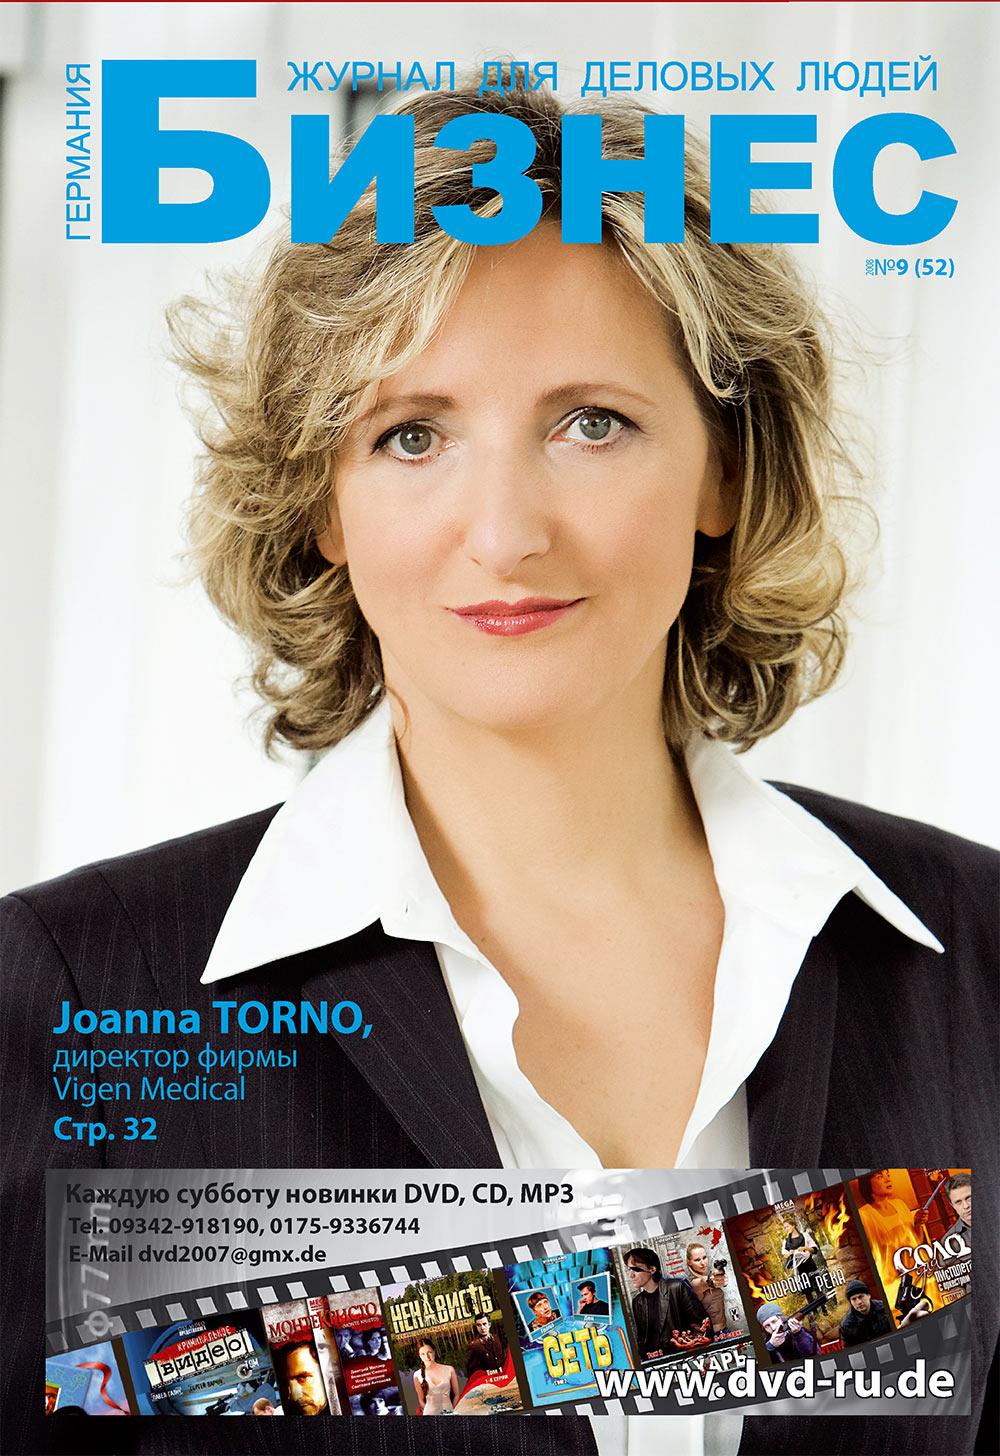 Бизнес (журнал). 2008 год, номер 9, стр. 1